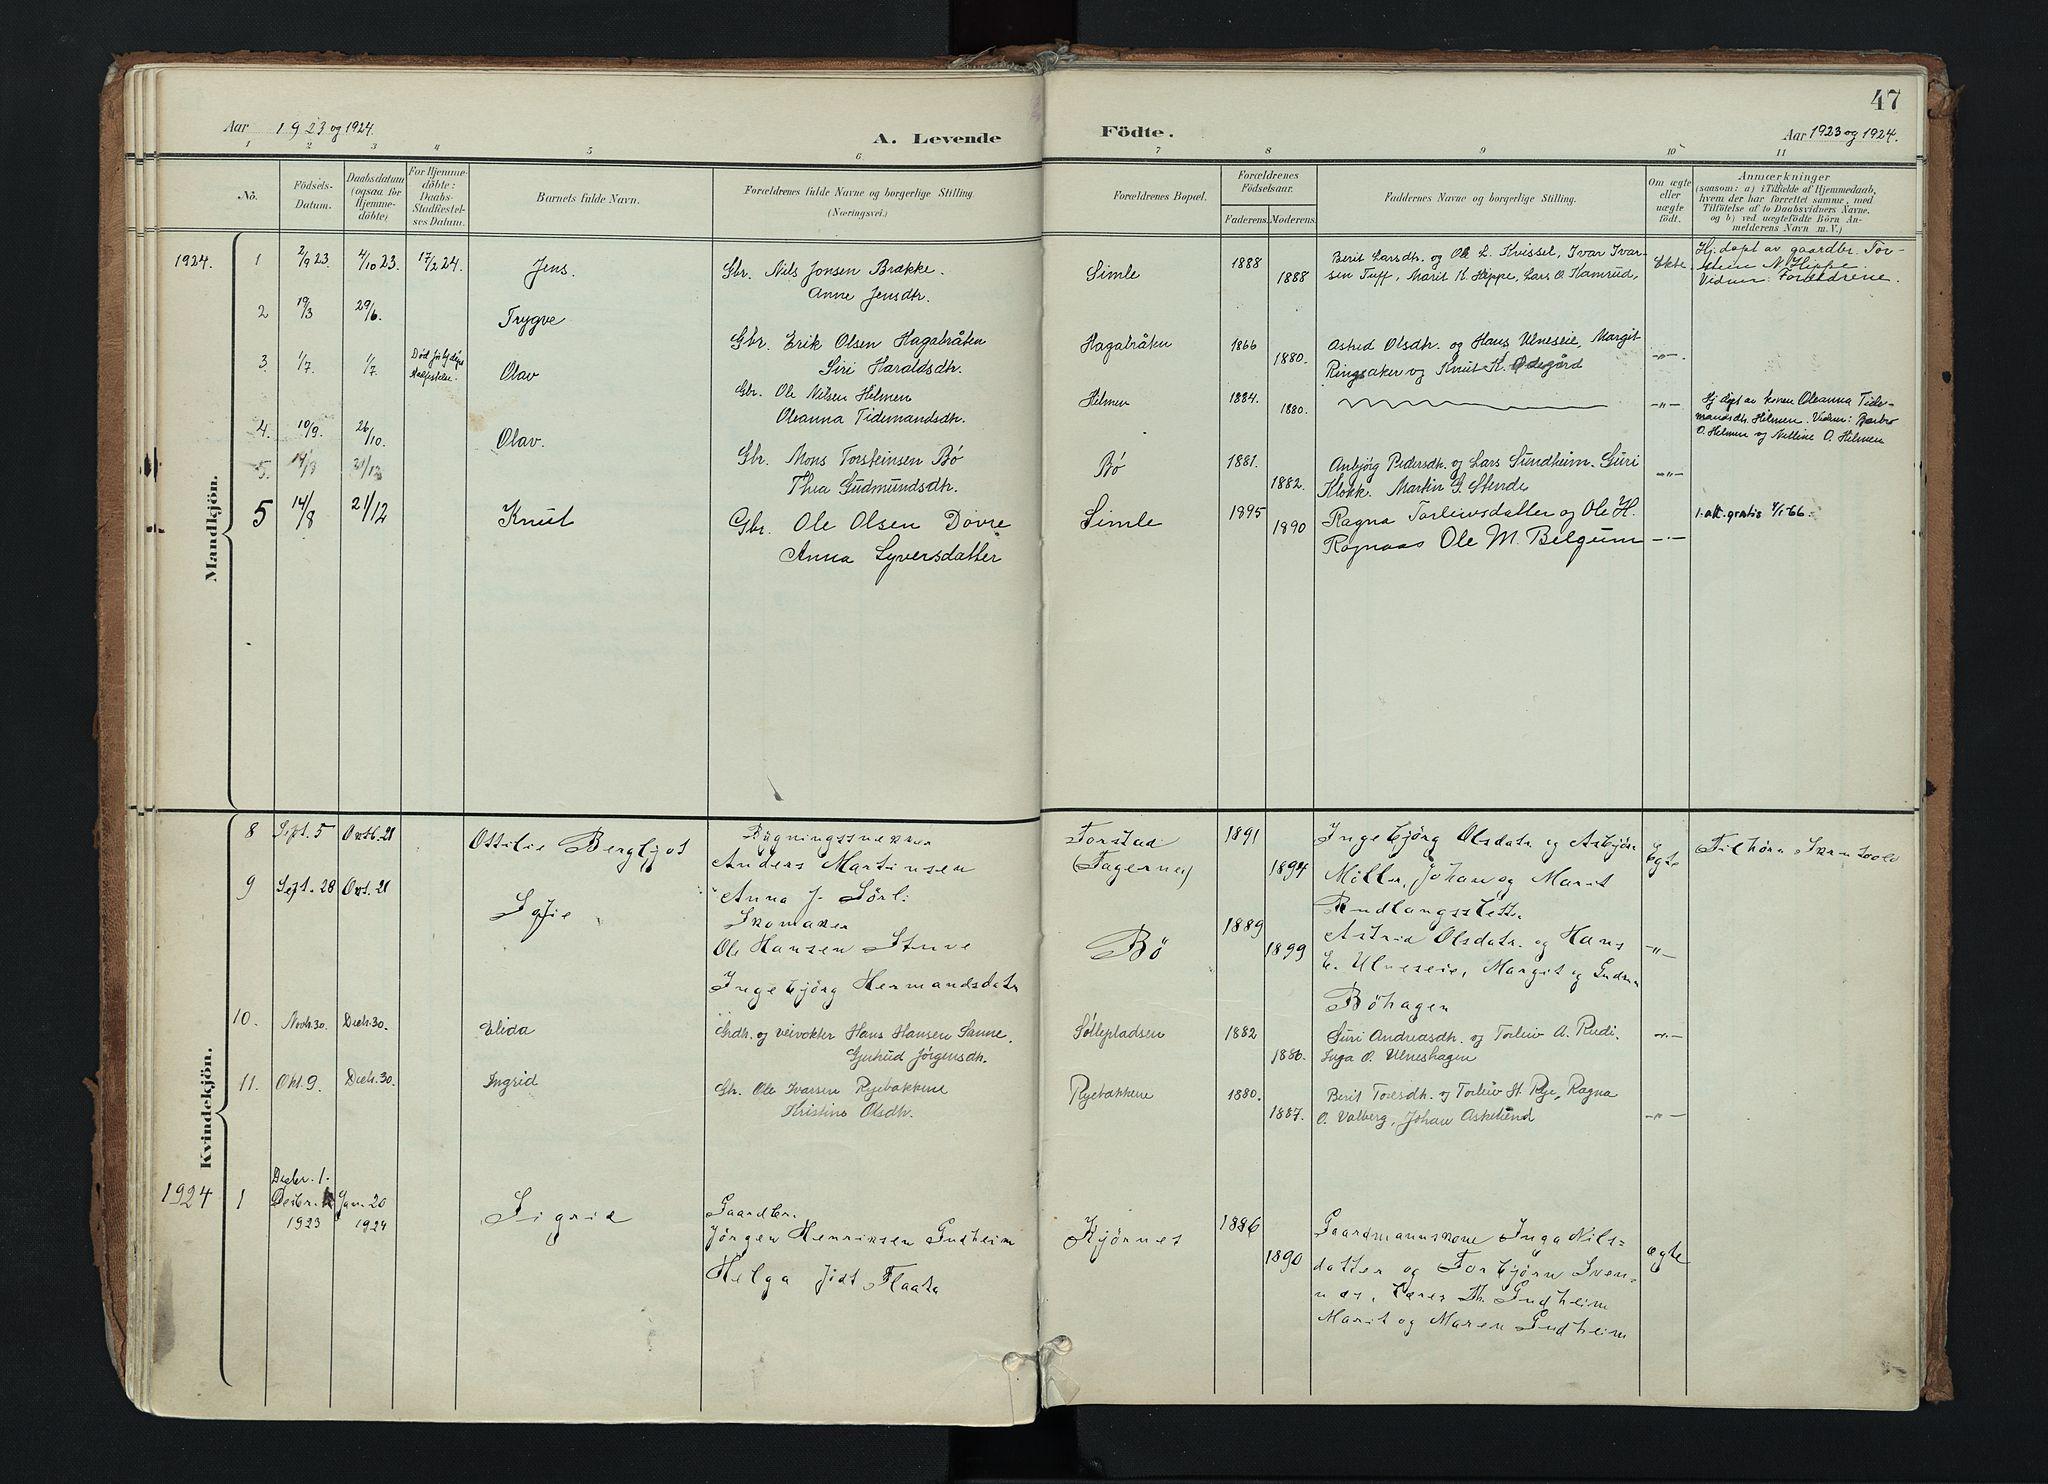 SAH, Nord-Aurdal prestekontor, Ministerialbok nr. 17, 1897-1926, s. 47